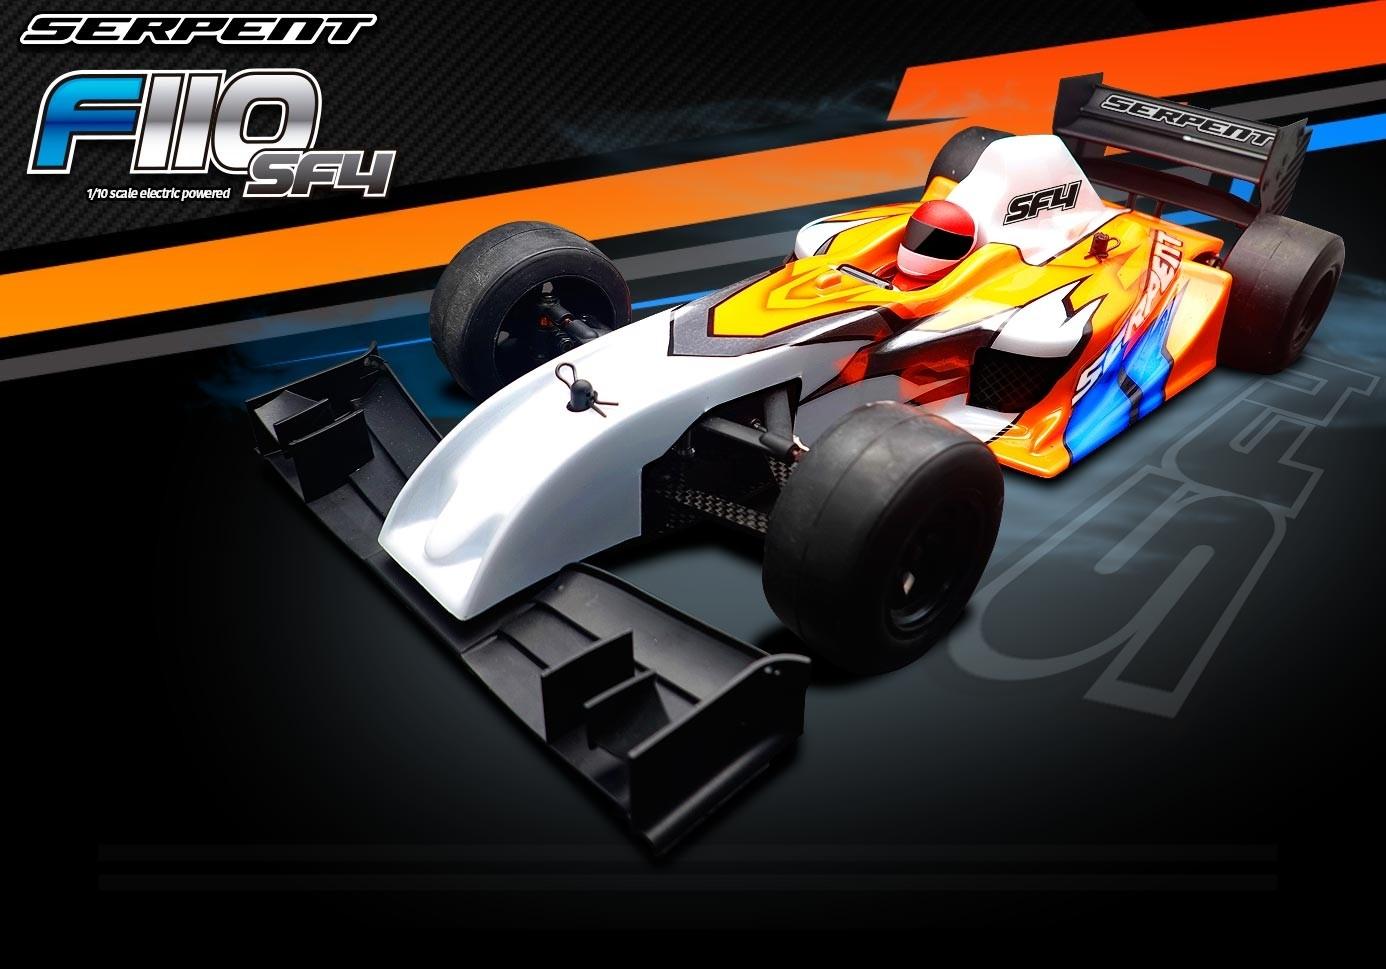 Serpent Formule 1 F110 SF4 1/10 EP KIT 410067